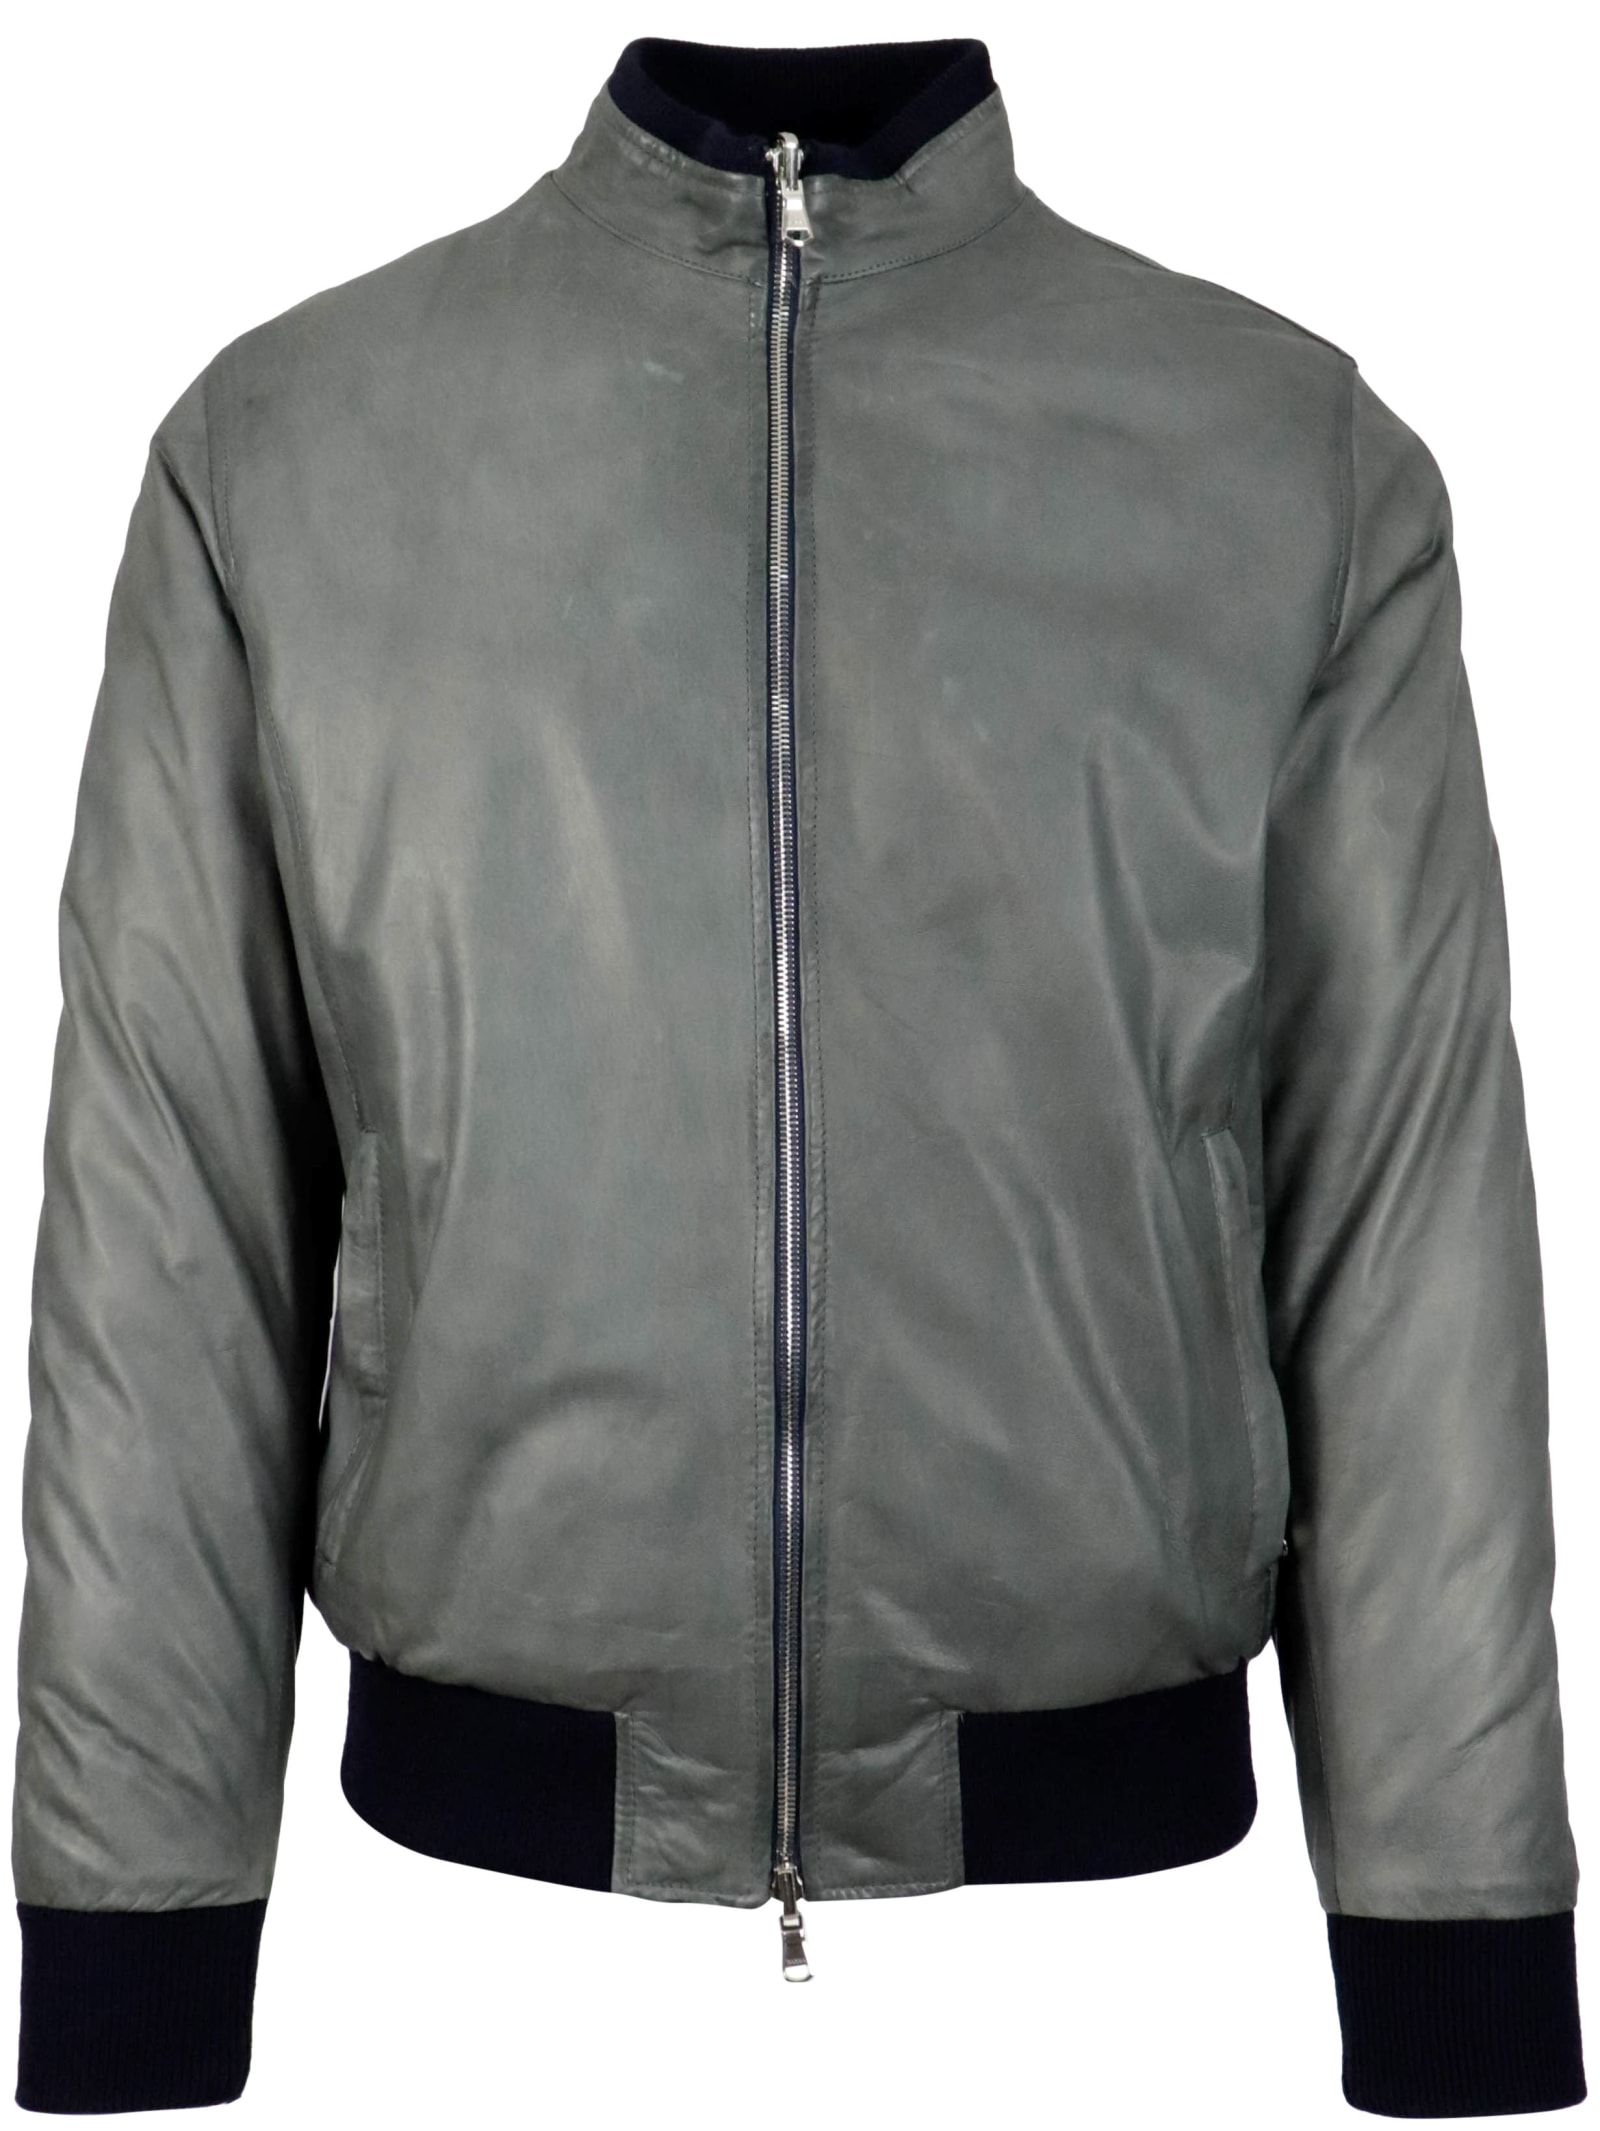 Barba Napoli 100% Leather Leather Jacket